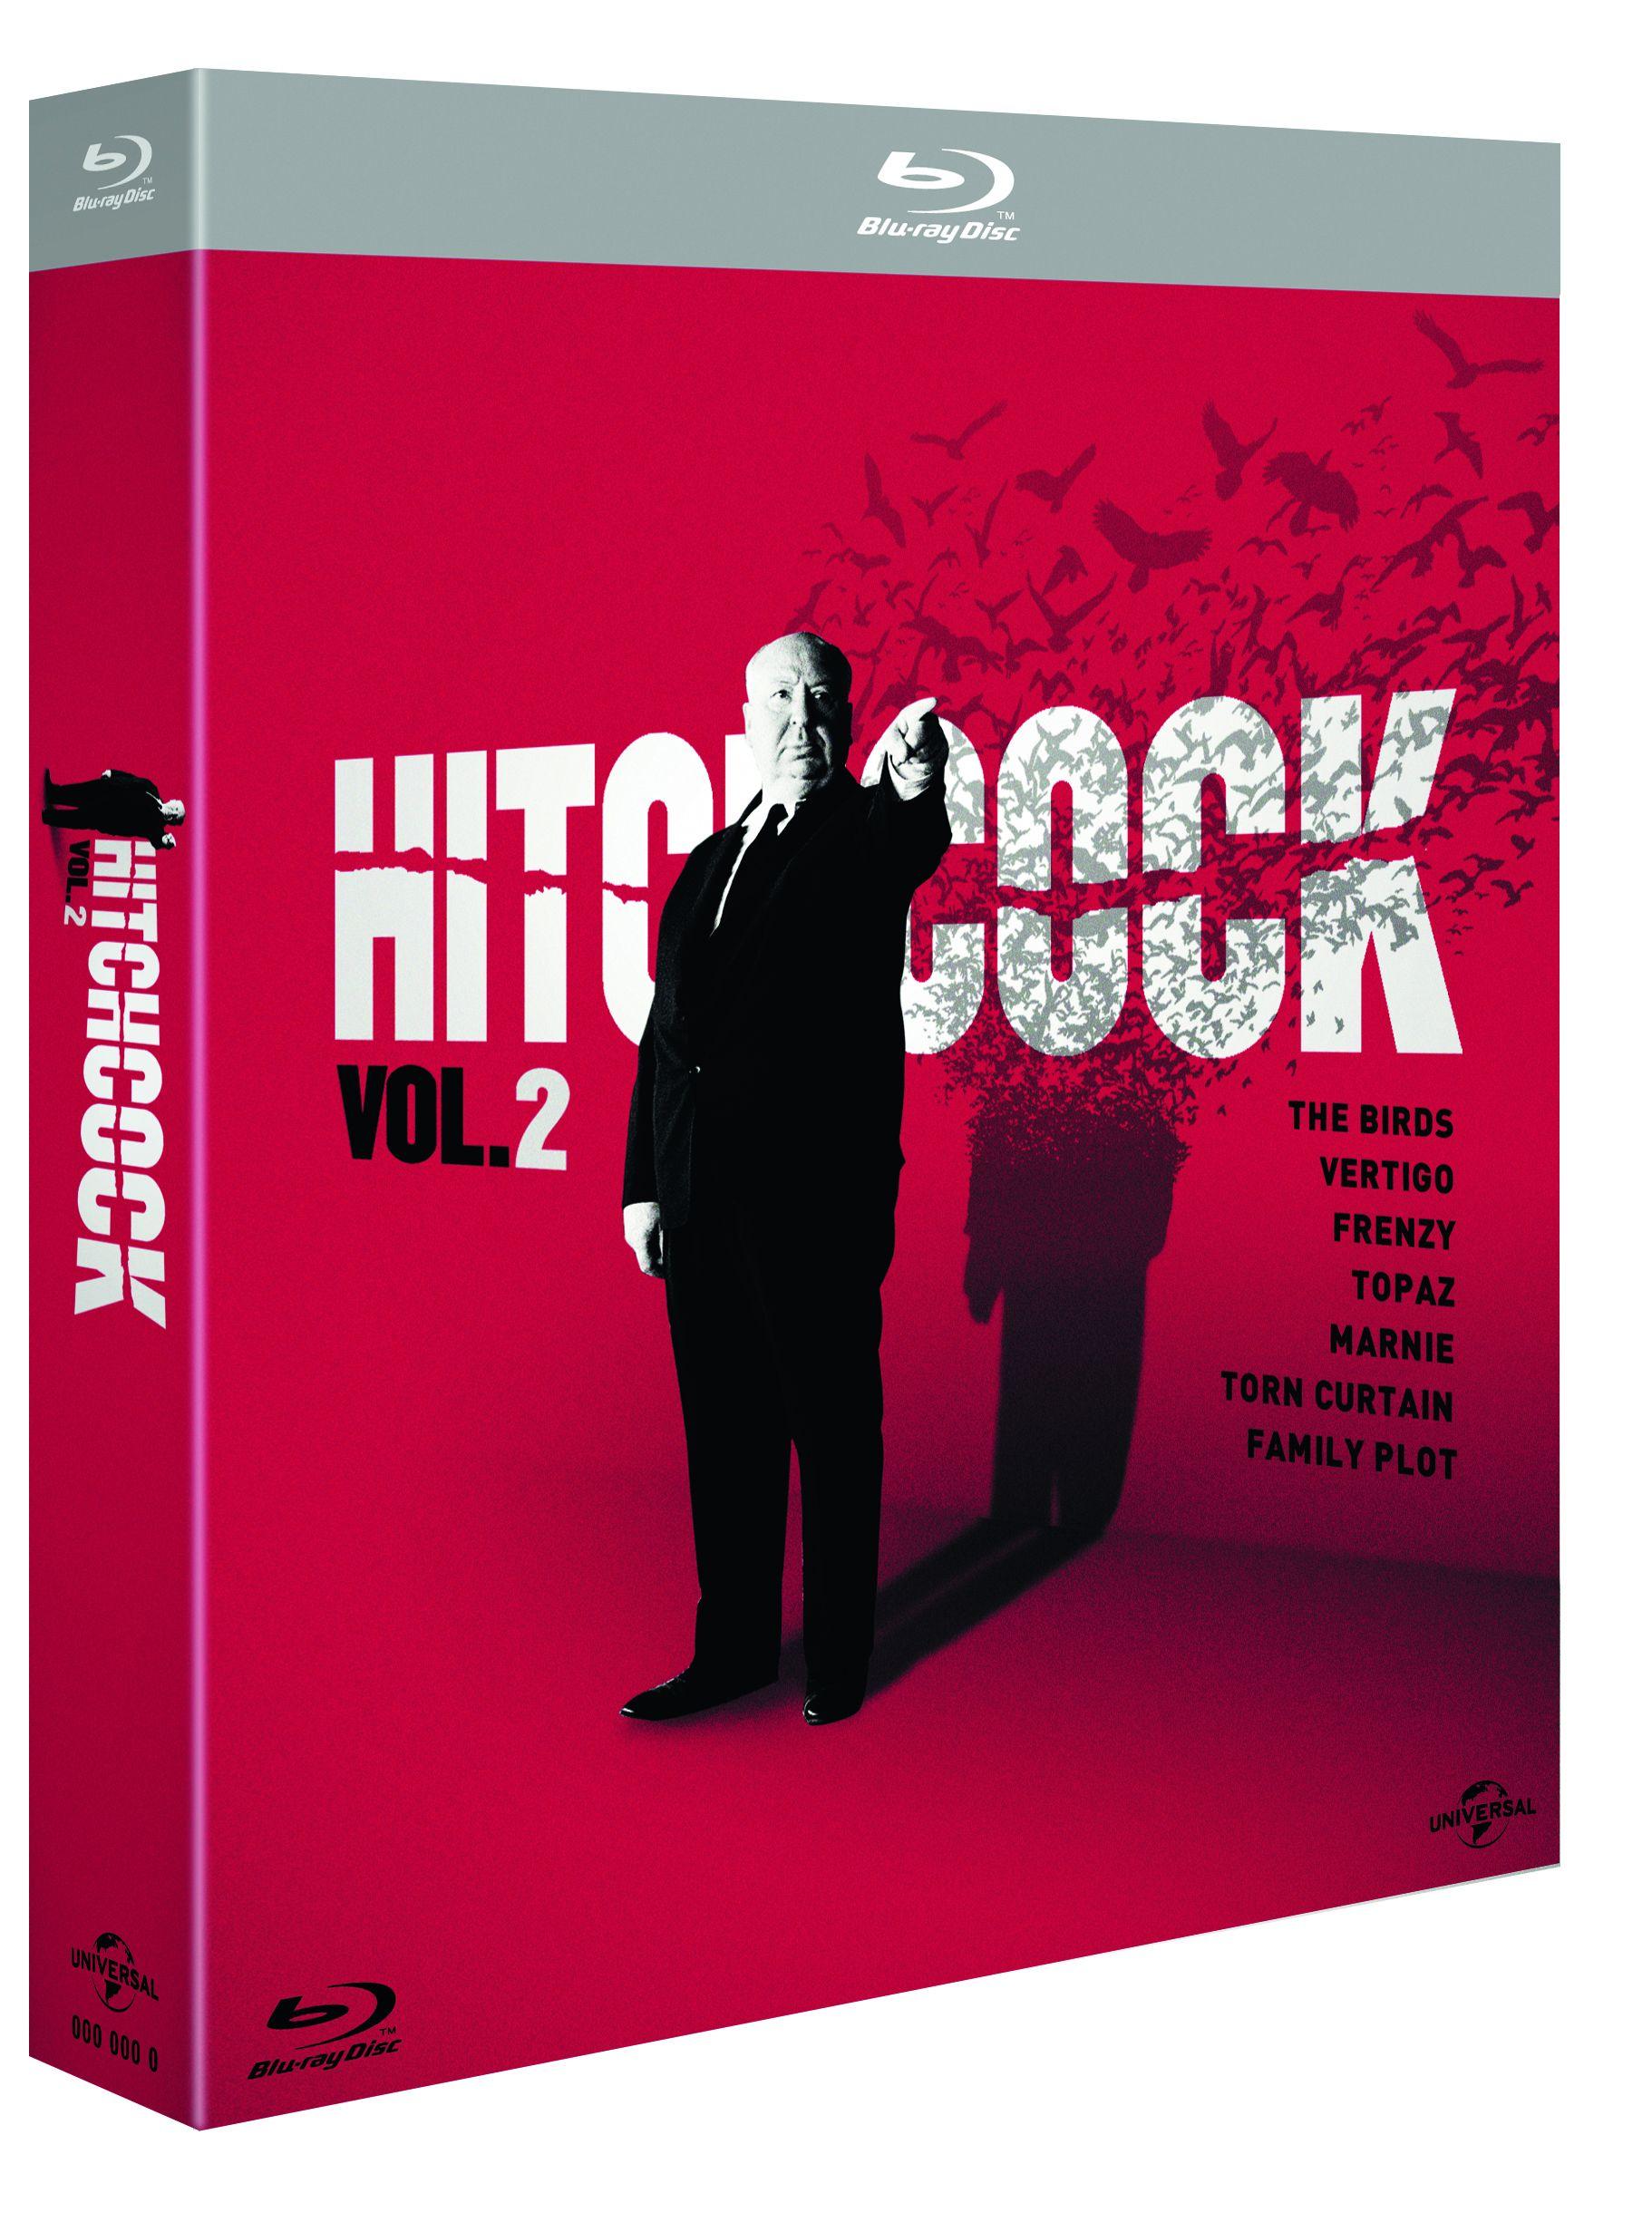 hitchcock boxset blu-ray box 2